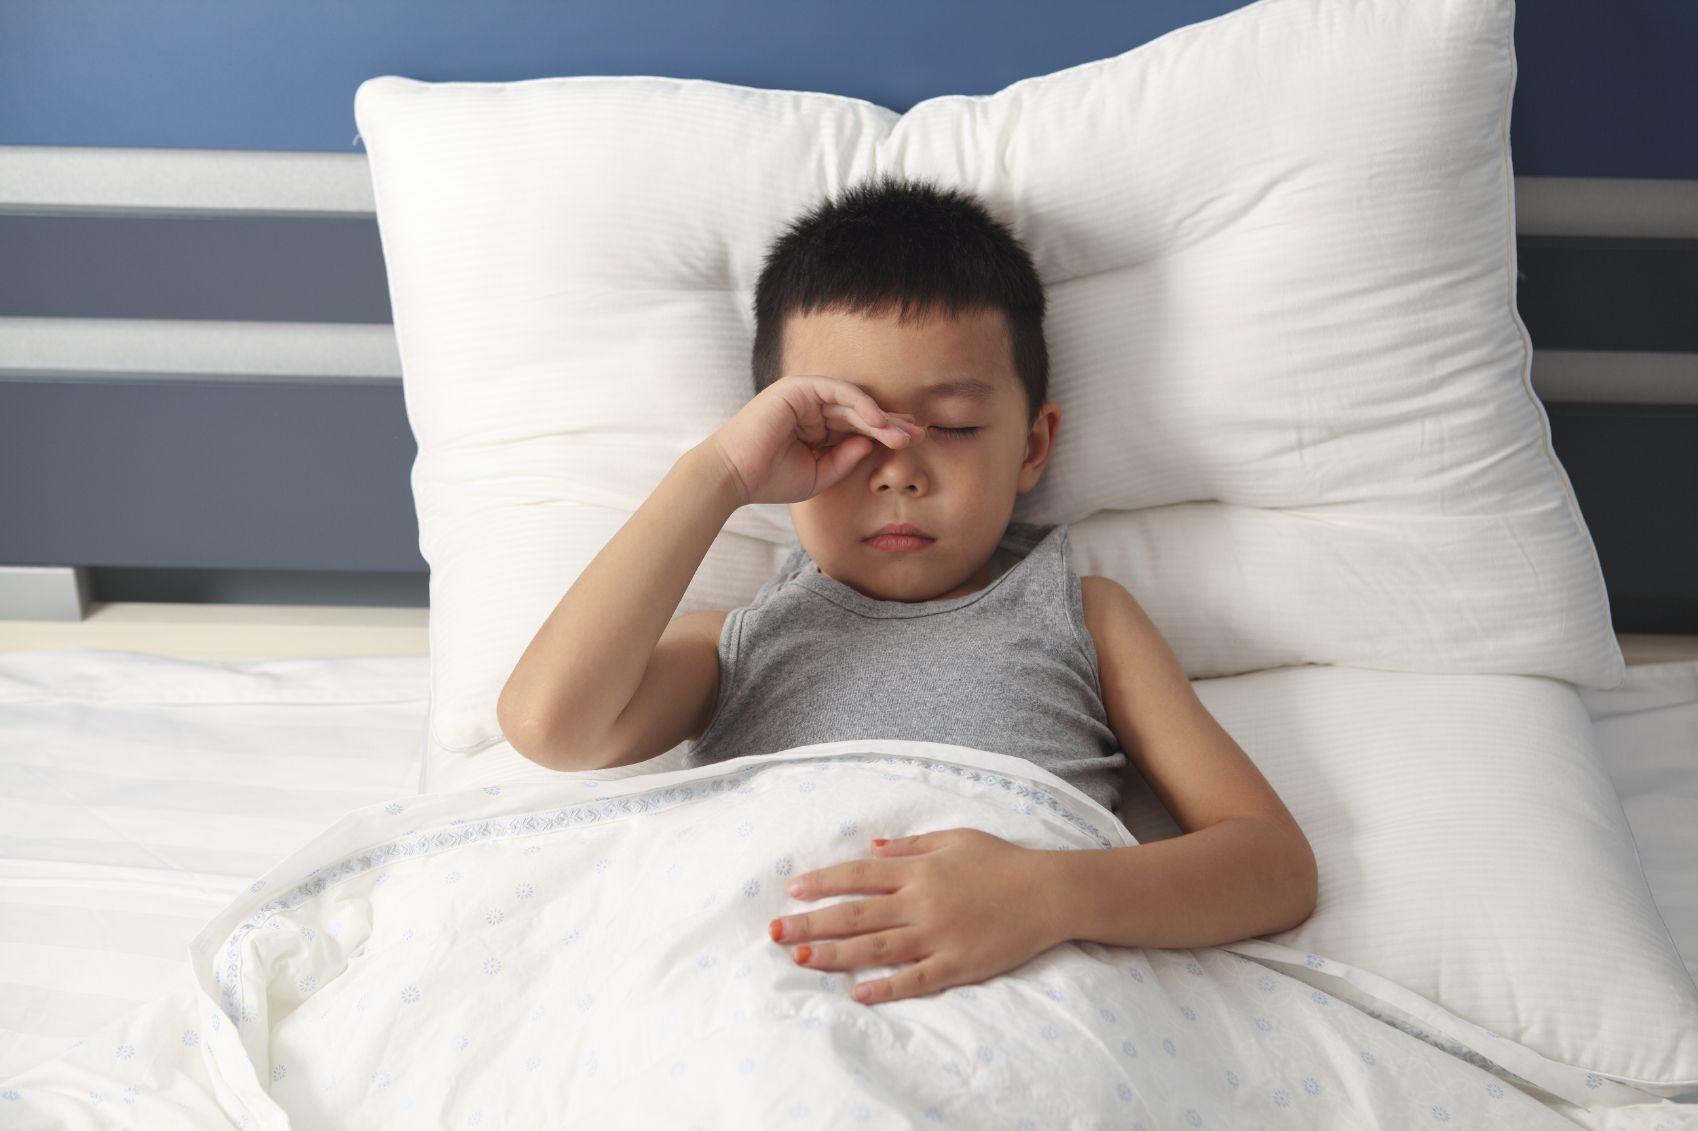 Sleepy.boy_.bed_.rubbing.eye_